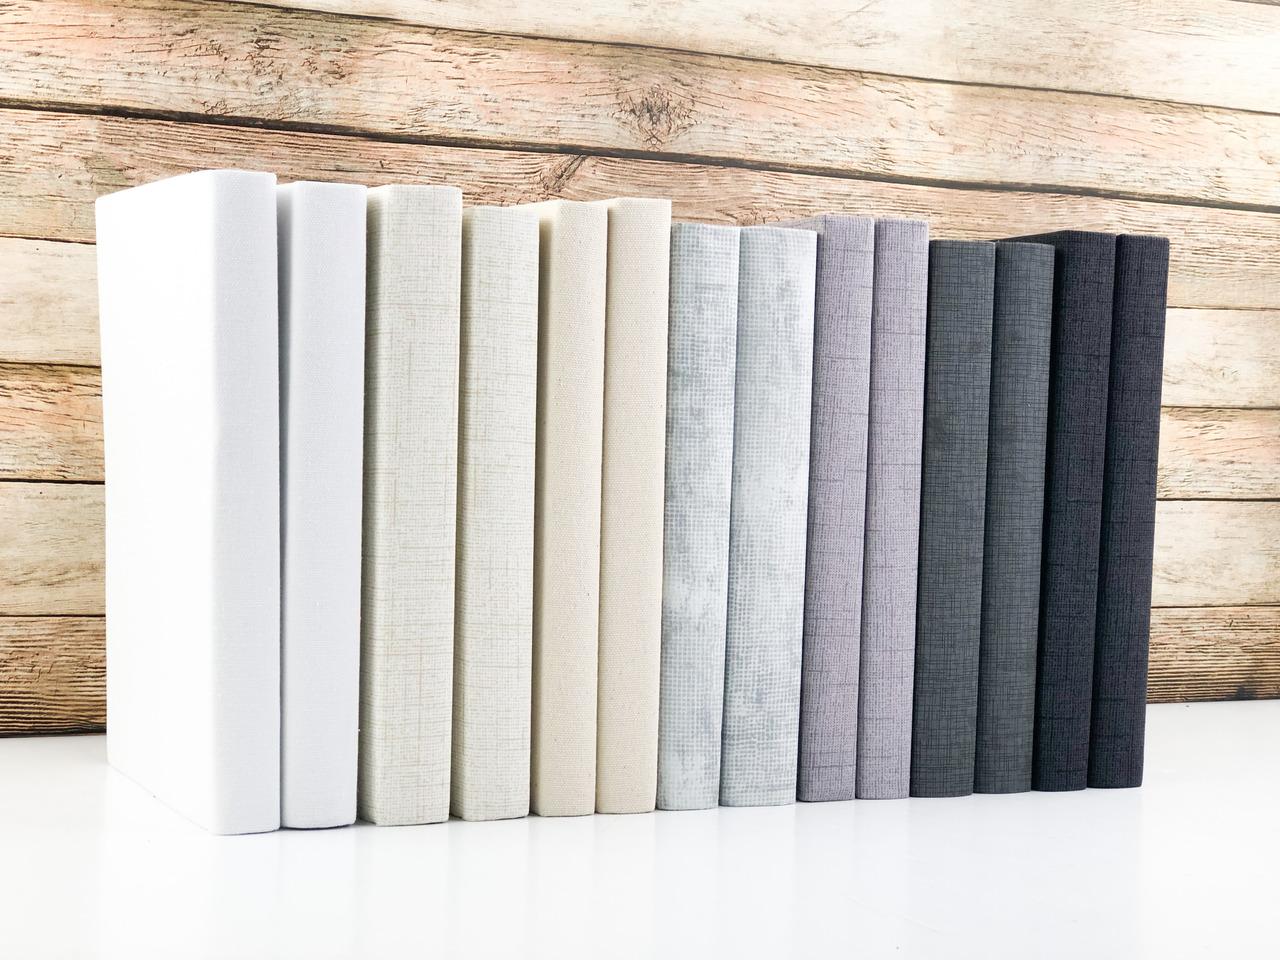 Set of 5 Decorative Books- Textured Light Gray